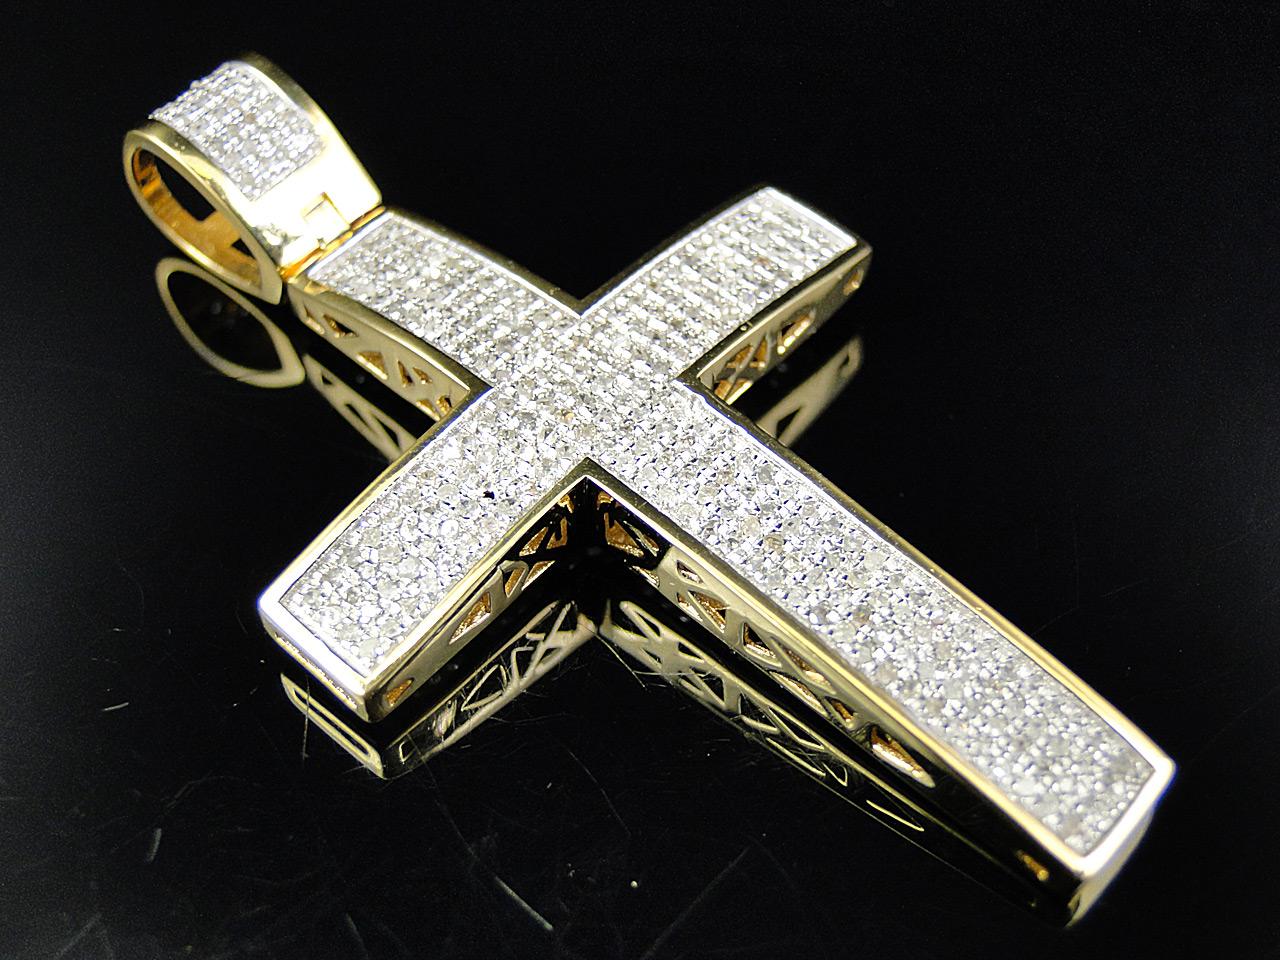 Large Genuine Diamond Cross Pendant Charm 1 25 Ct In 10k